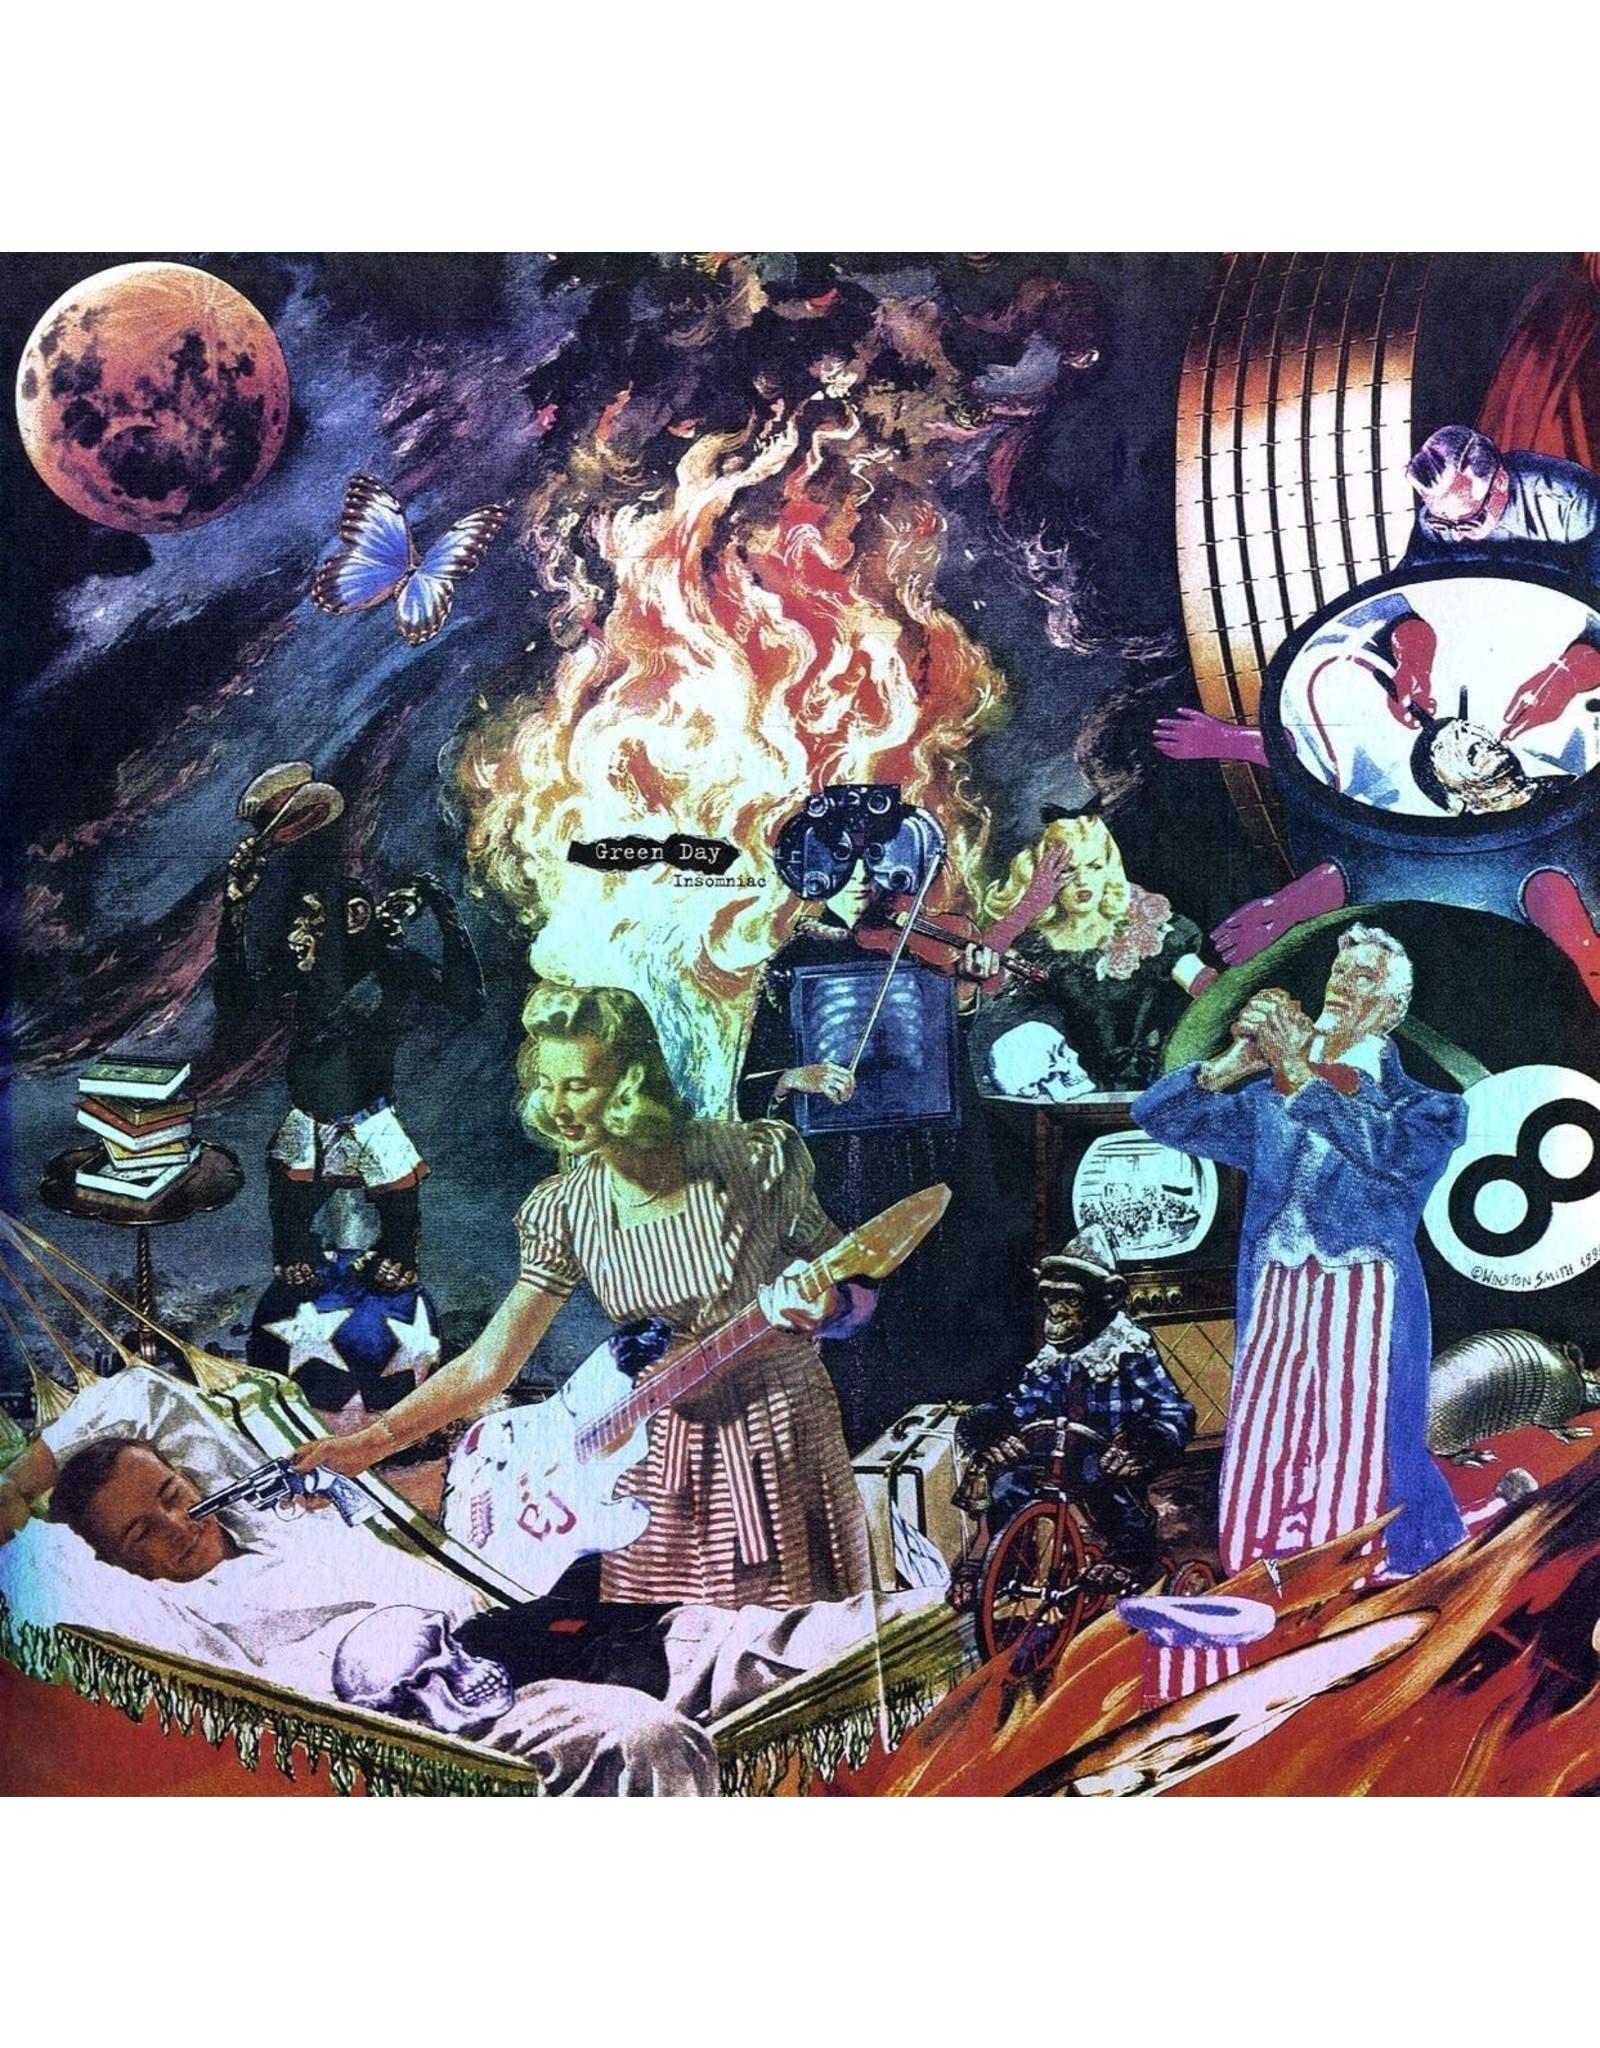 Green Day - Insomniac (25th Anniversary)